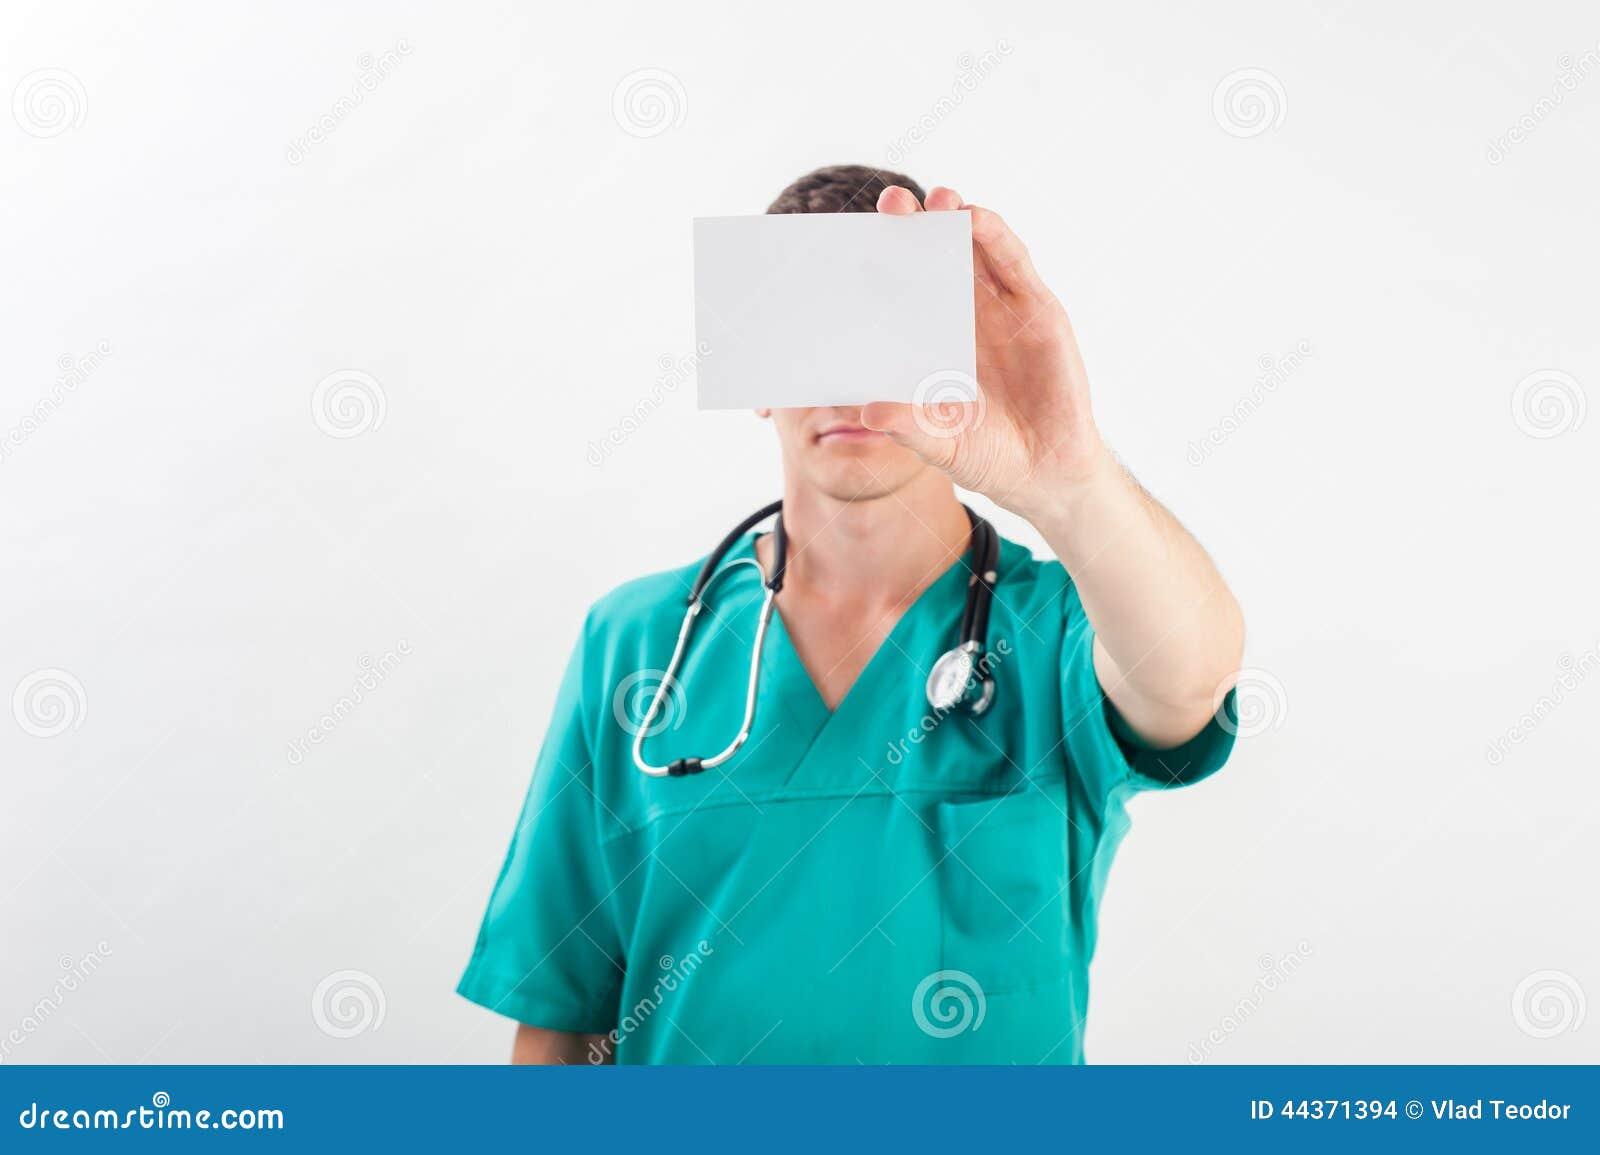 Uomo in uniforme medica